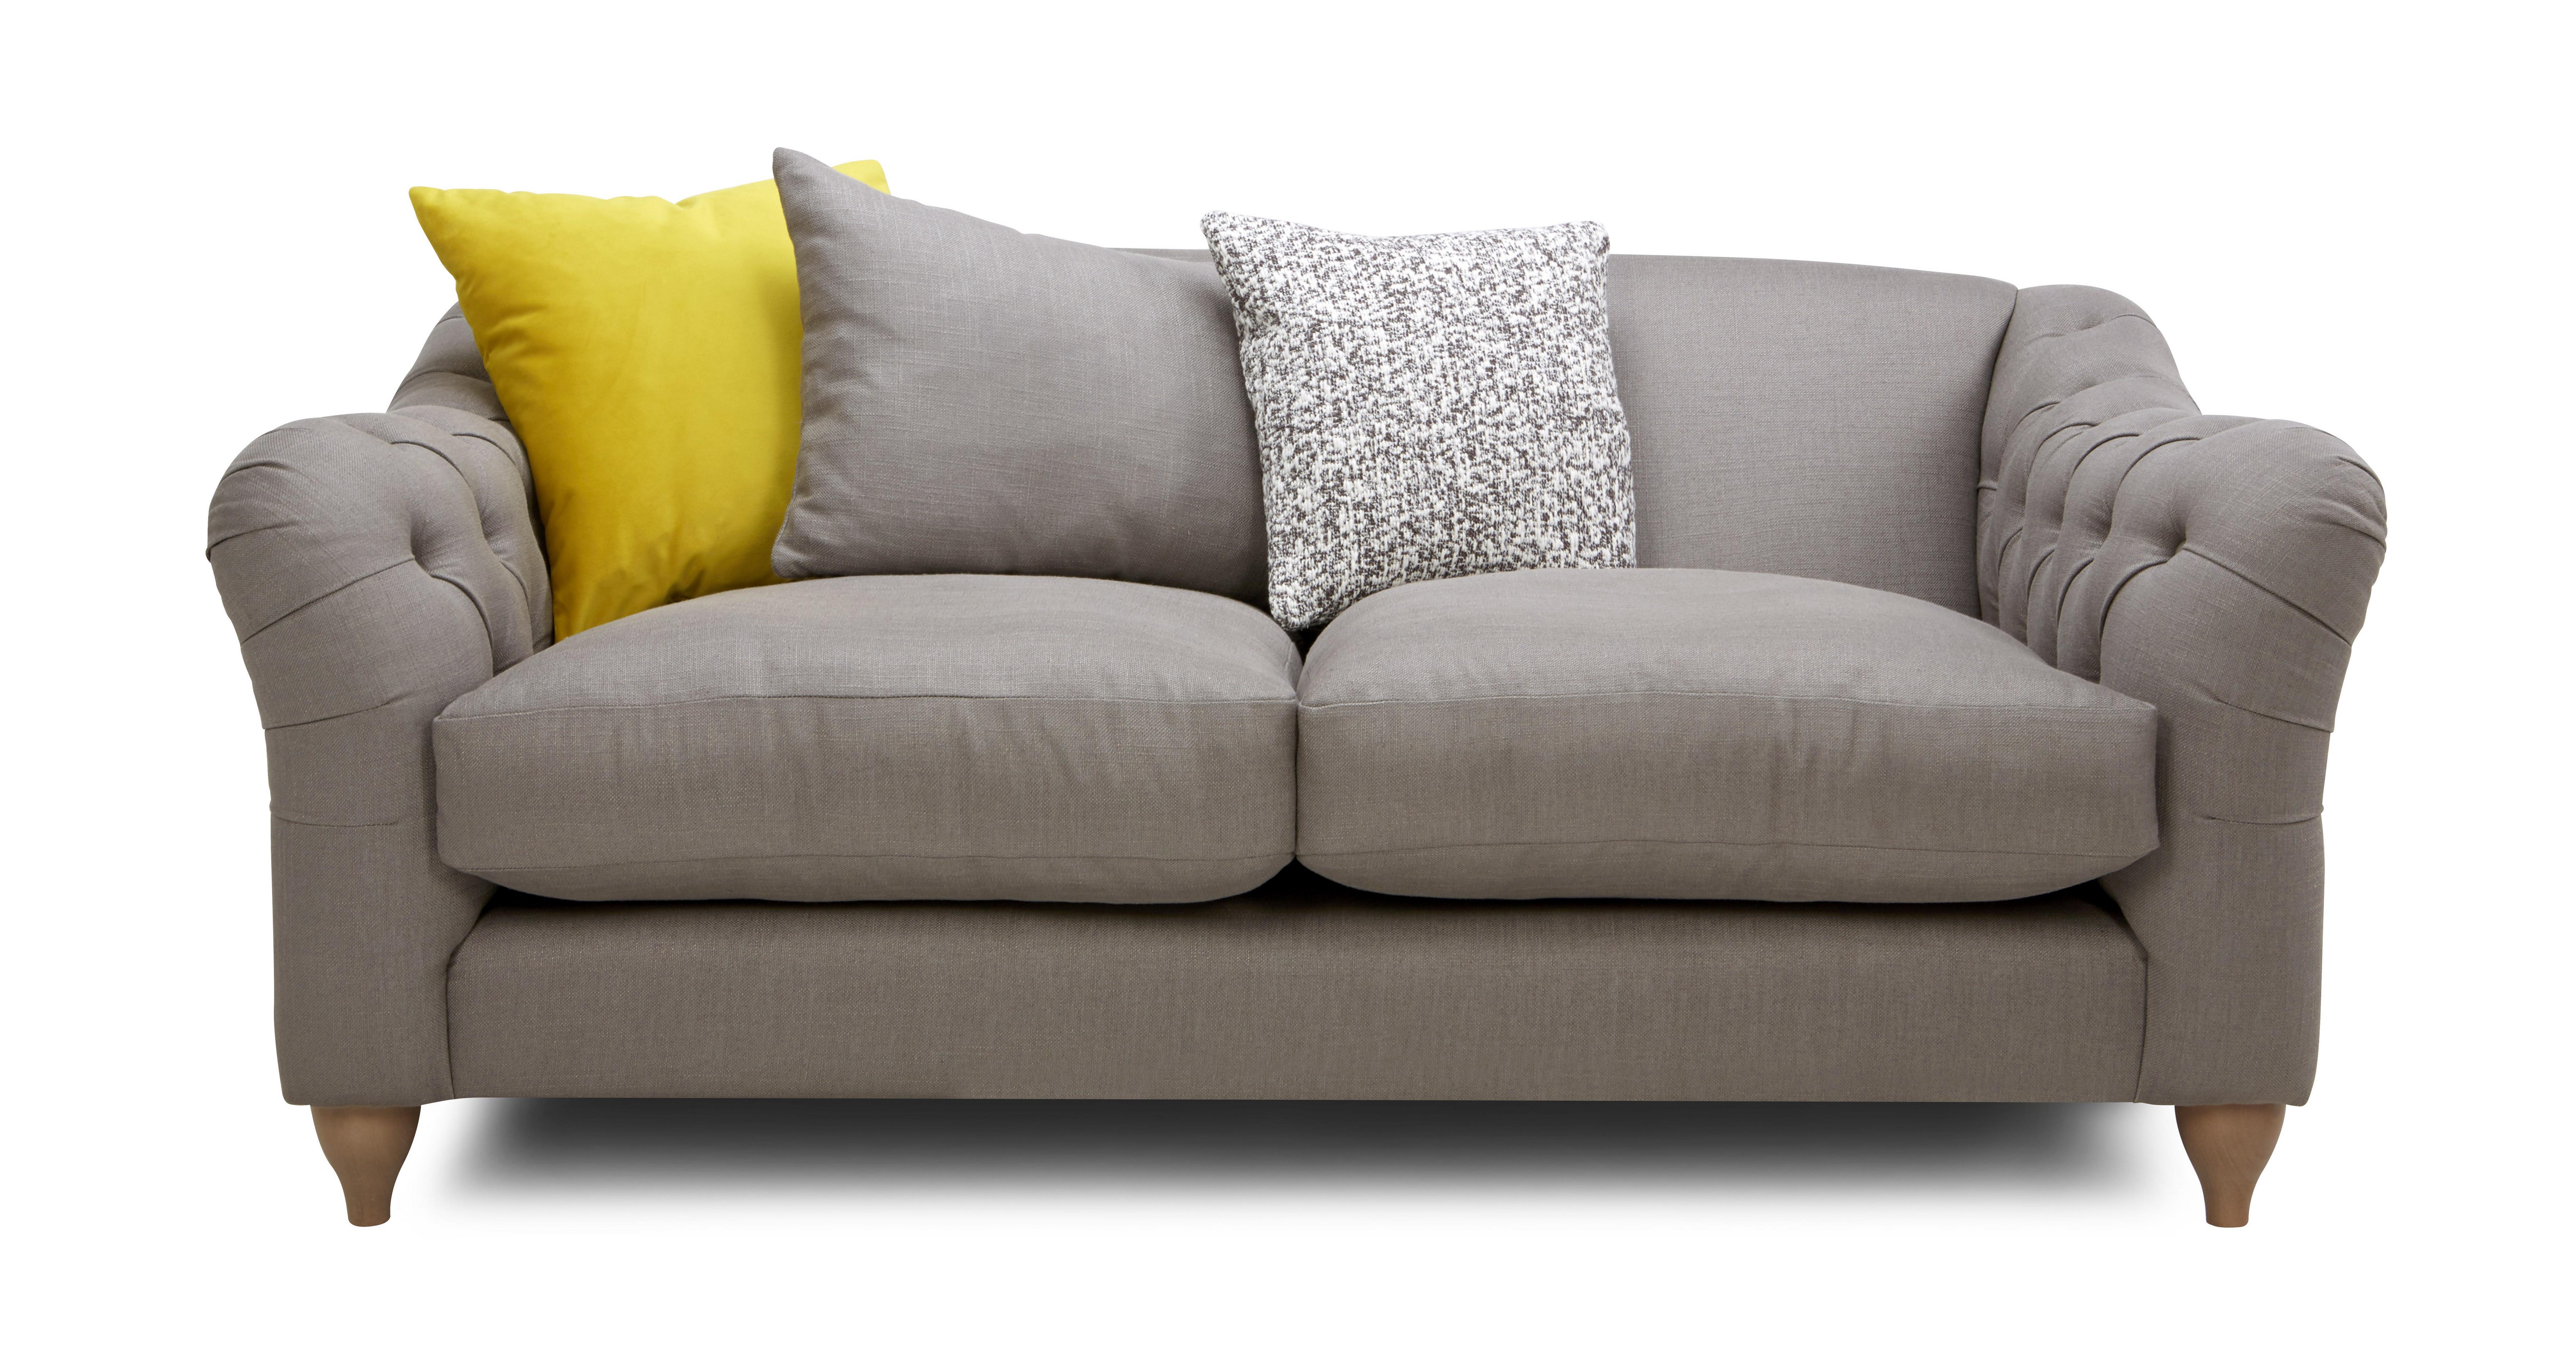 squashy sofas uk gus atwood sofa canada casper 2 seater linen dfs